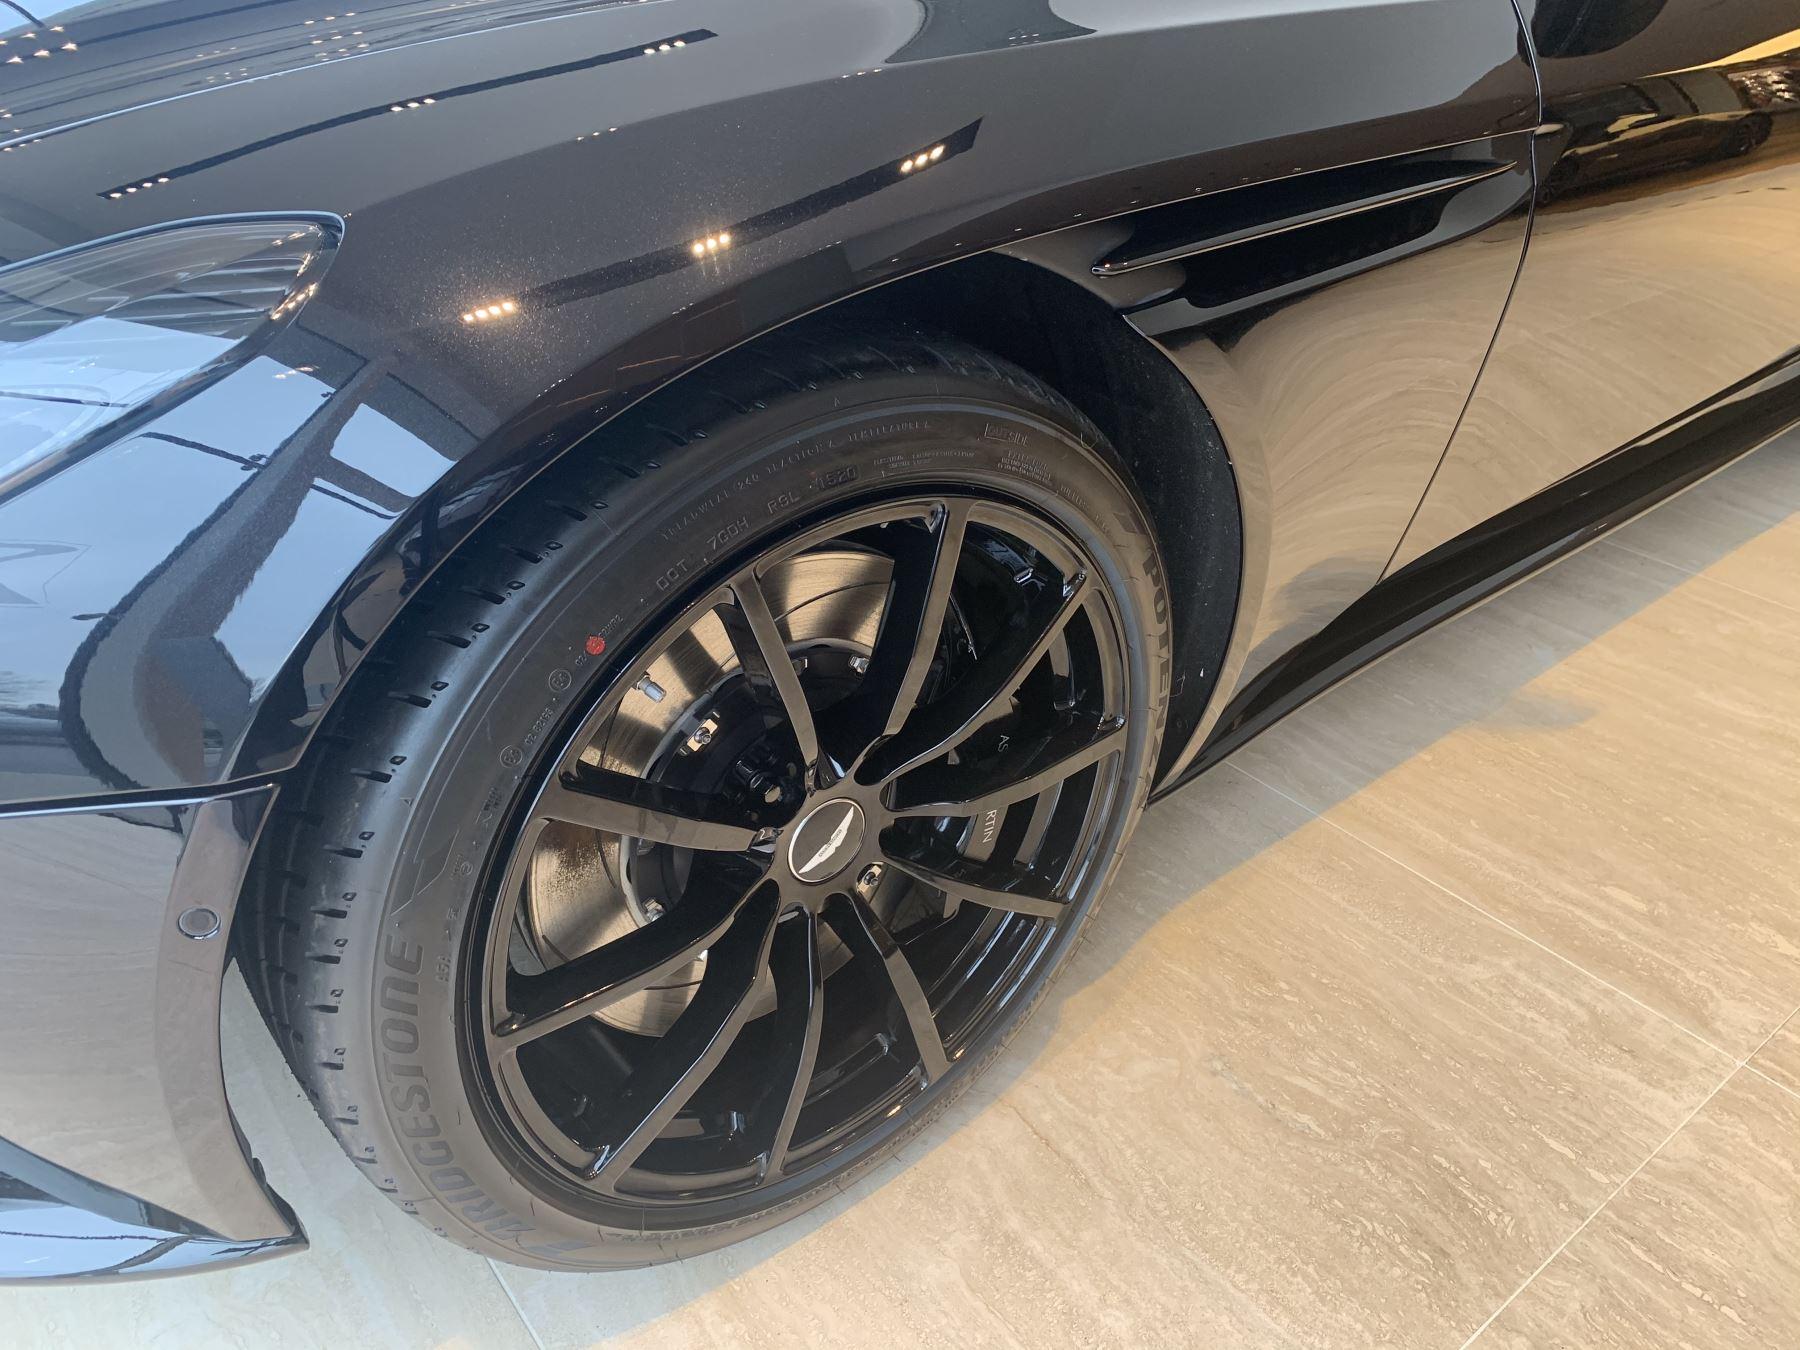 Aston Martin DB11 V8 Touchtronic image 10